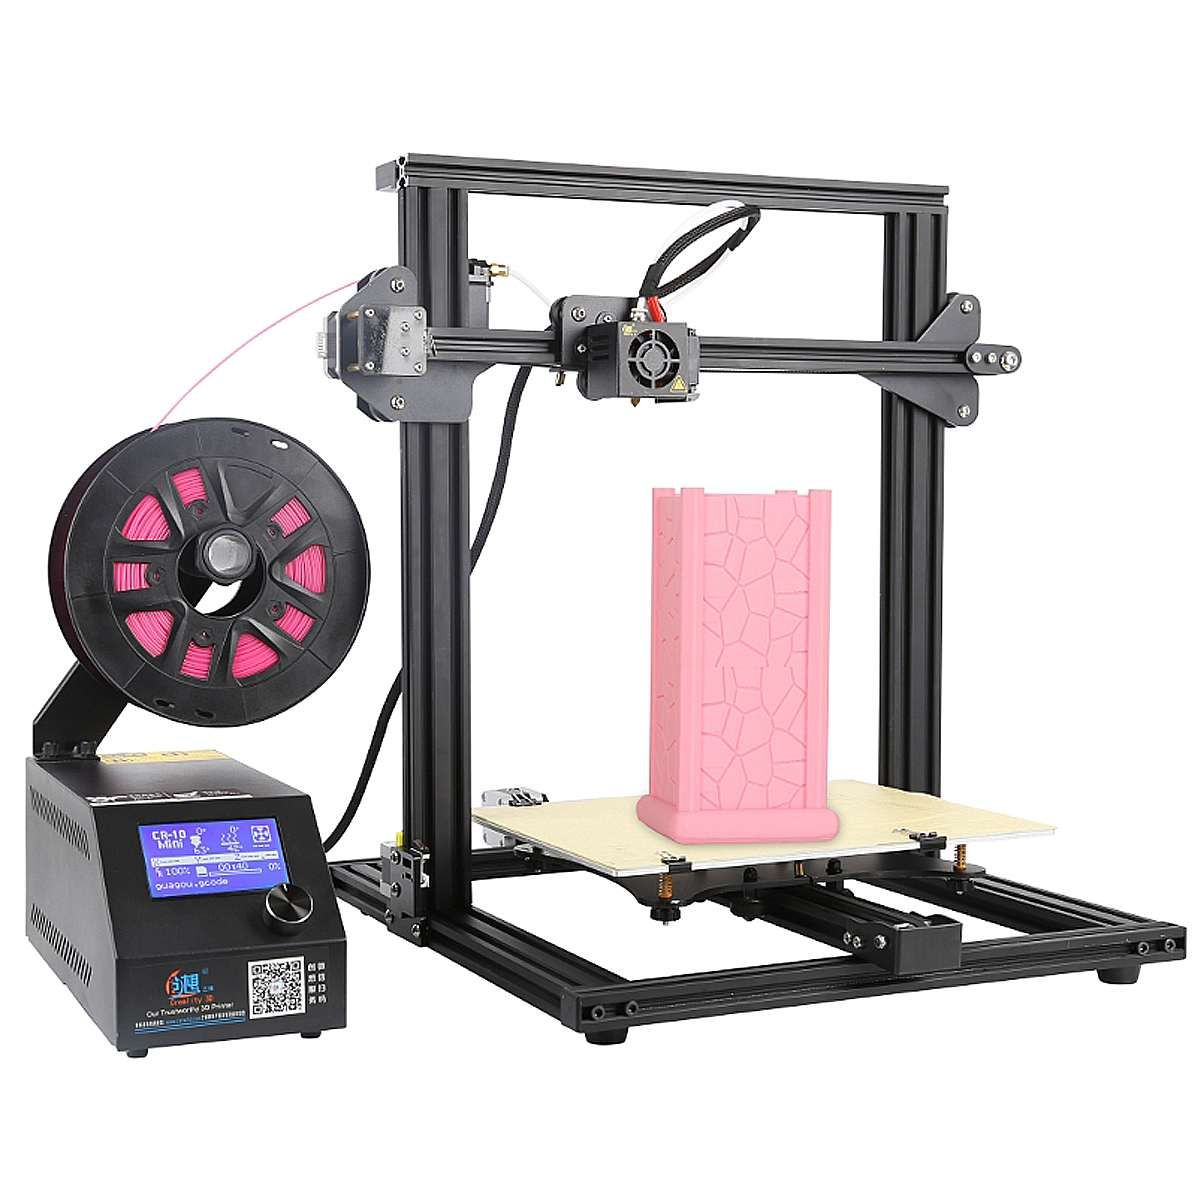 CR-10 Mini DIY 3D Printer Kit Support Resume Print 300*220*300mm Large Printing Size 1.75mm 0.4mm Nozzle